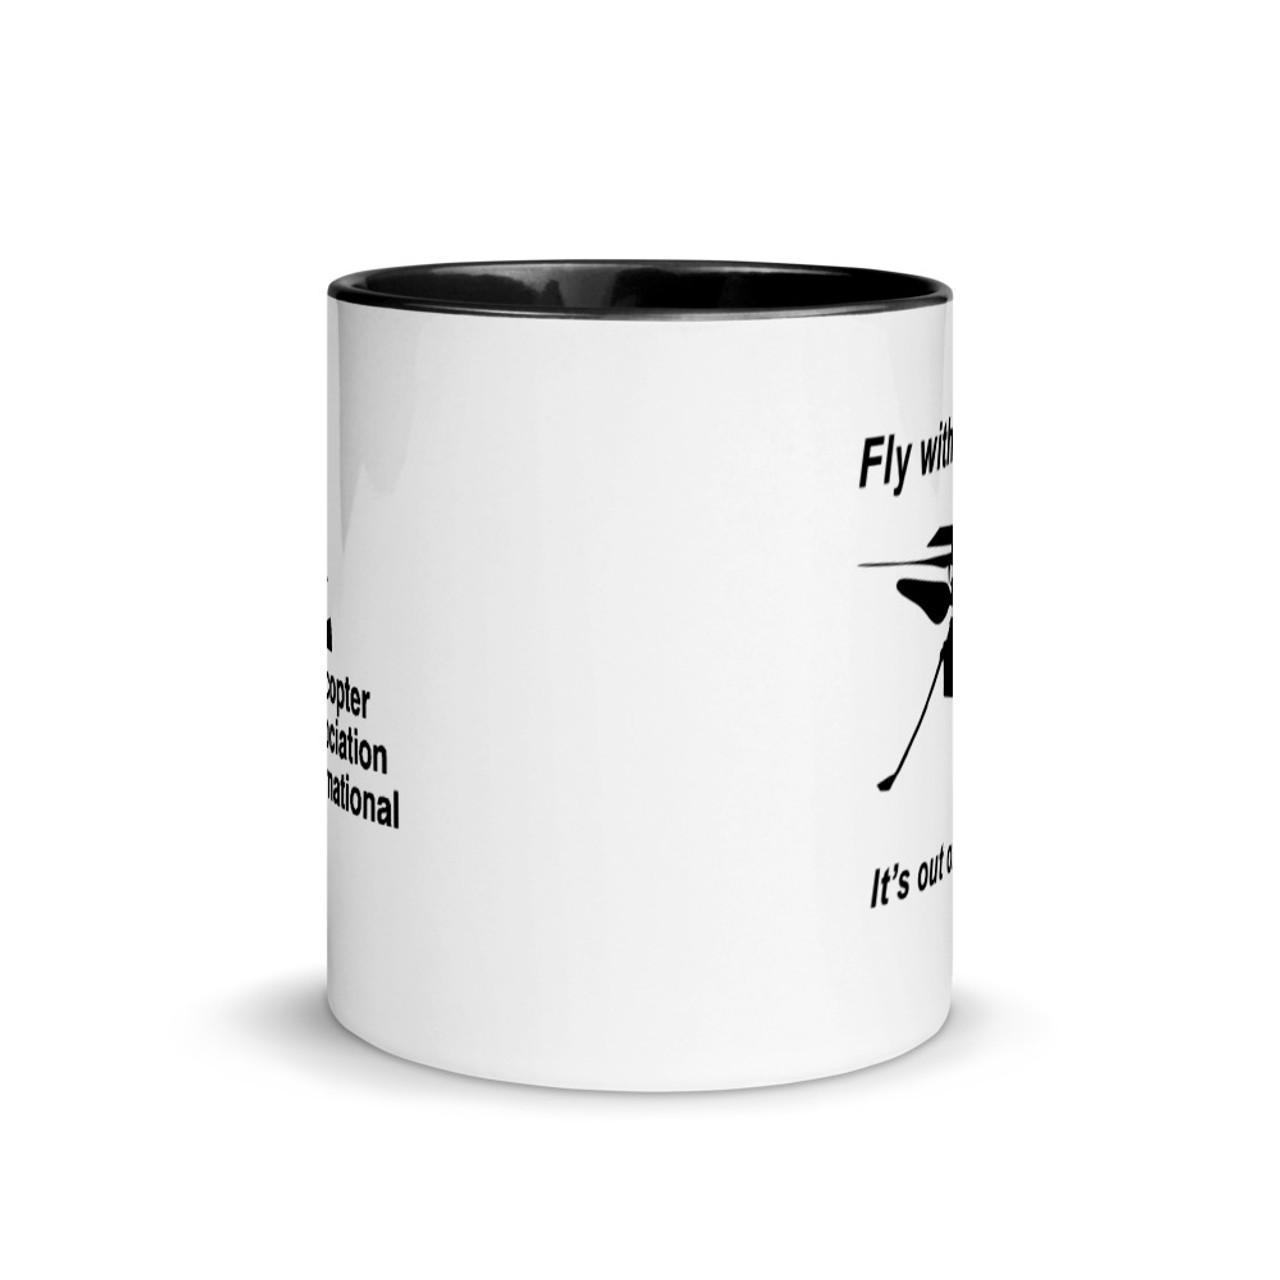 """Ingenuity"" White 11oz. Mug with Black Trim"